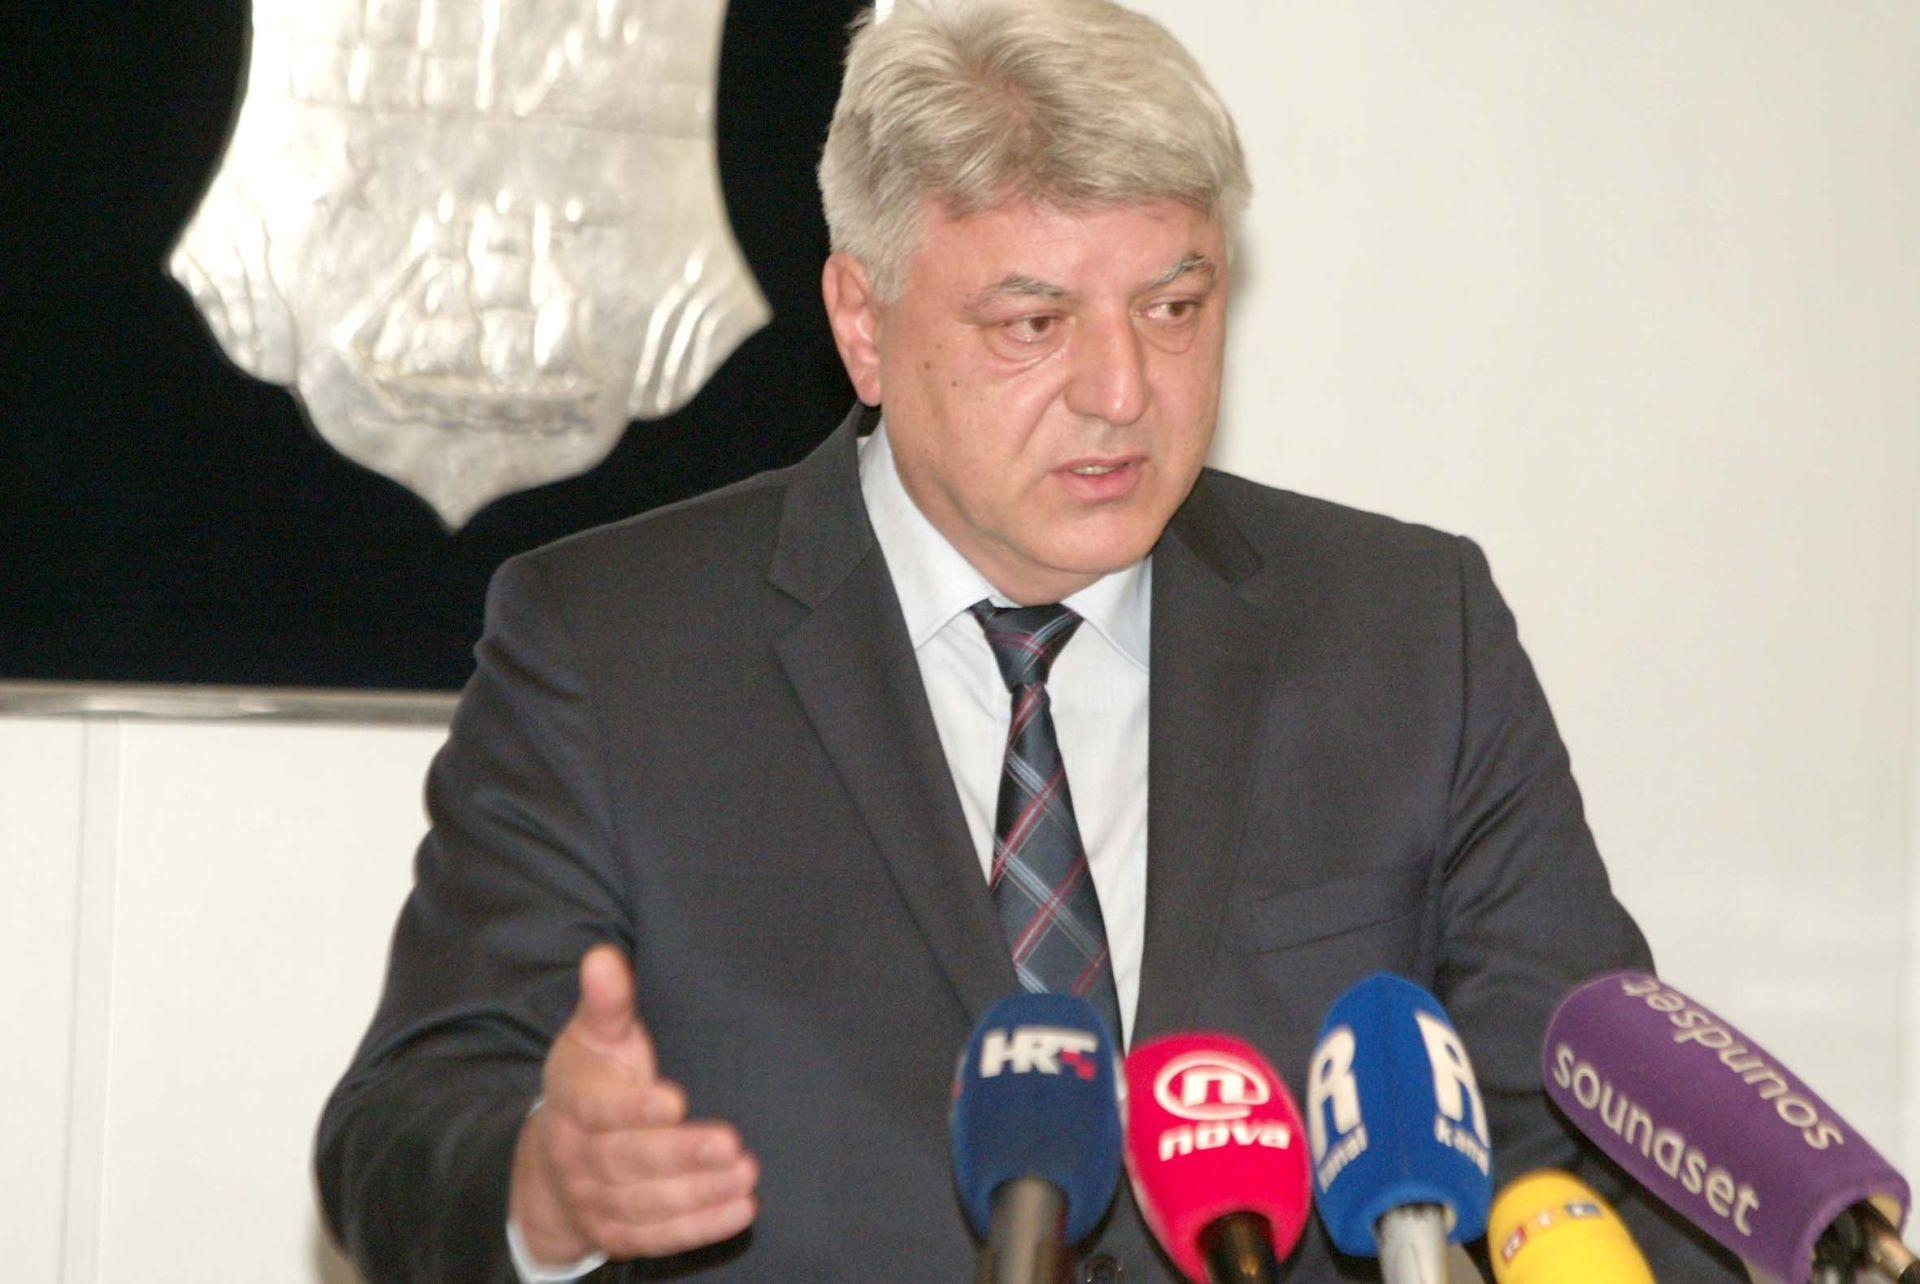 Komadina: Bilo bi dobro za SDP da Glavni odbor ne potvrdi raspuštanje splitske organizacije